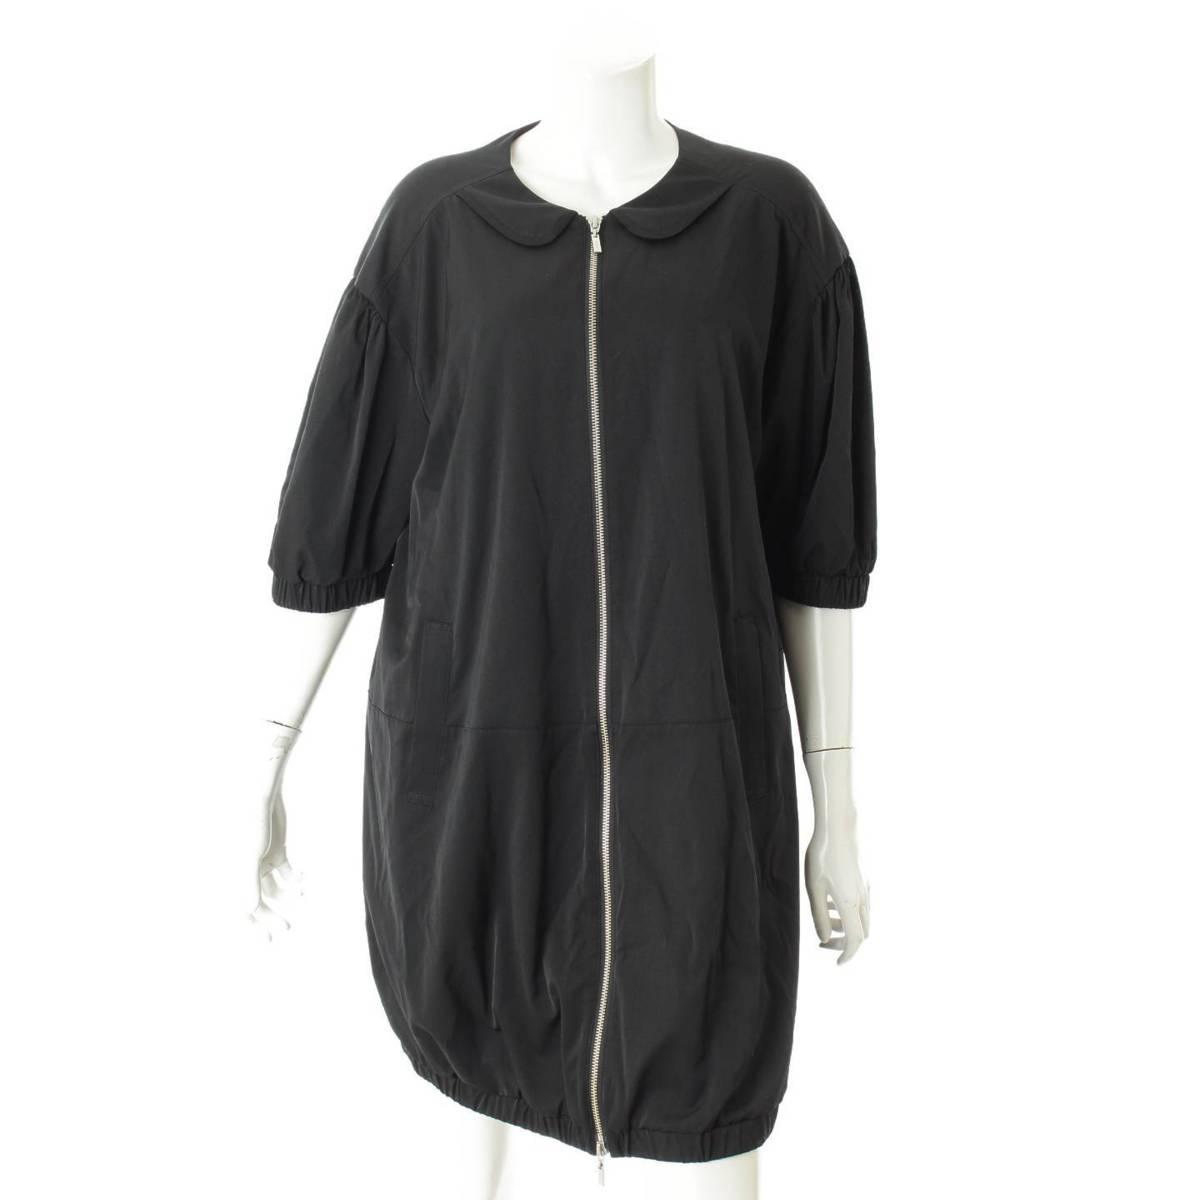 【30%OFFセール】【フォクシーニューヨーク】Foxey New York レインコート ドレス 37720 ブラック 40 【中古】【鑑定済・正規品保証】76110